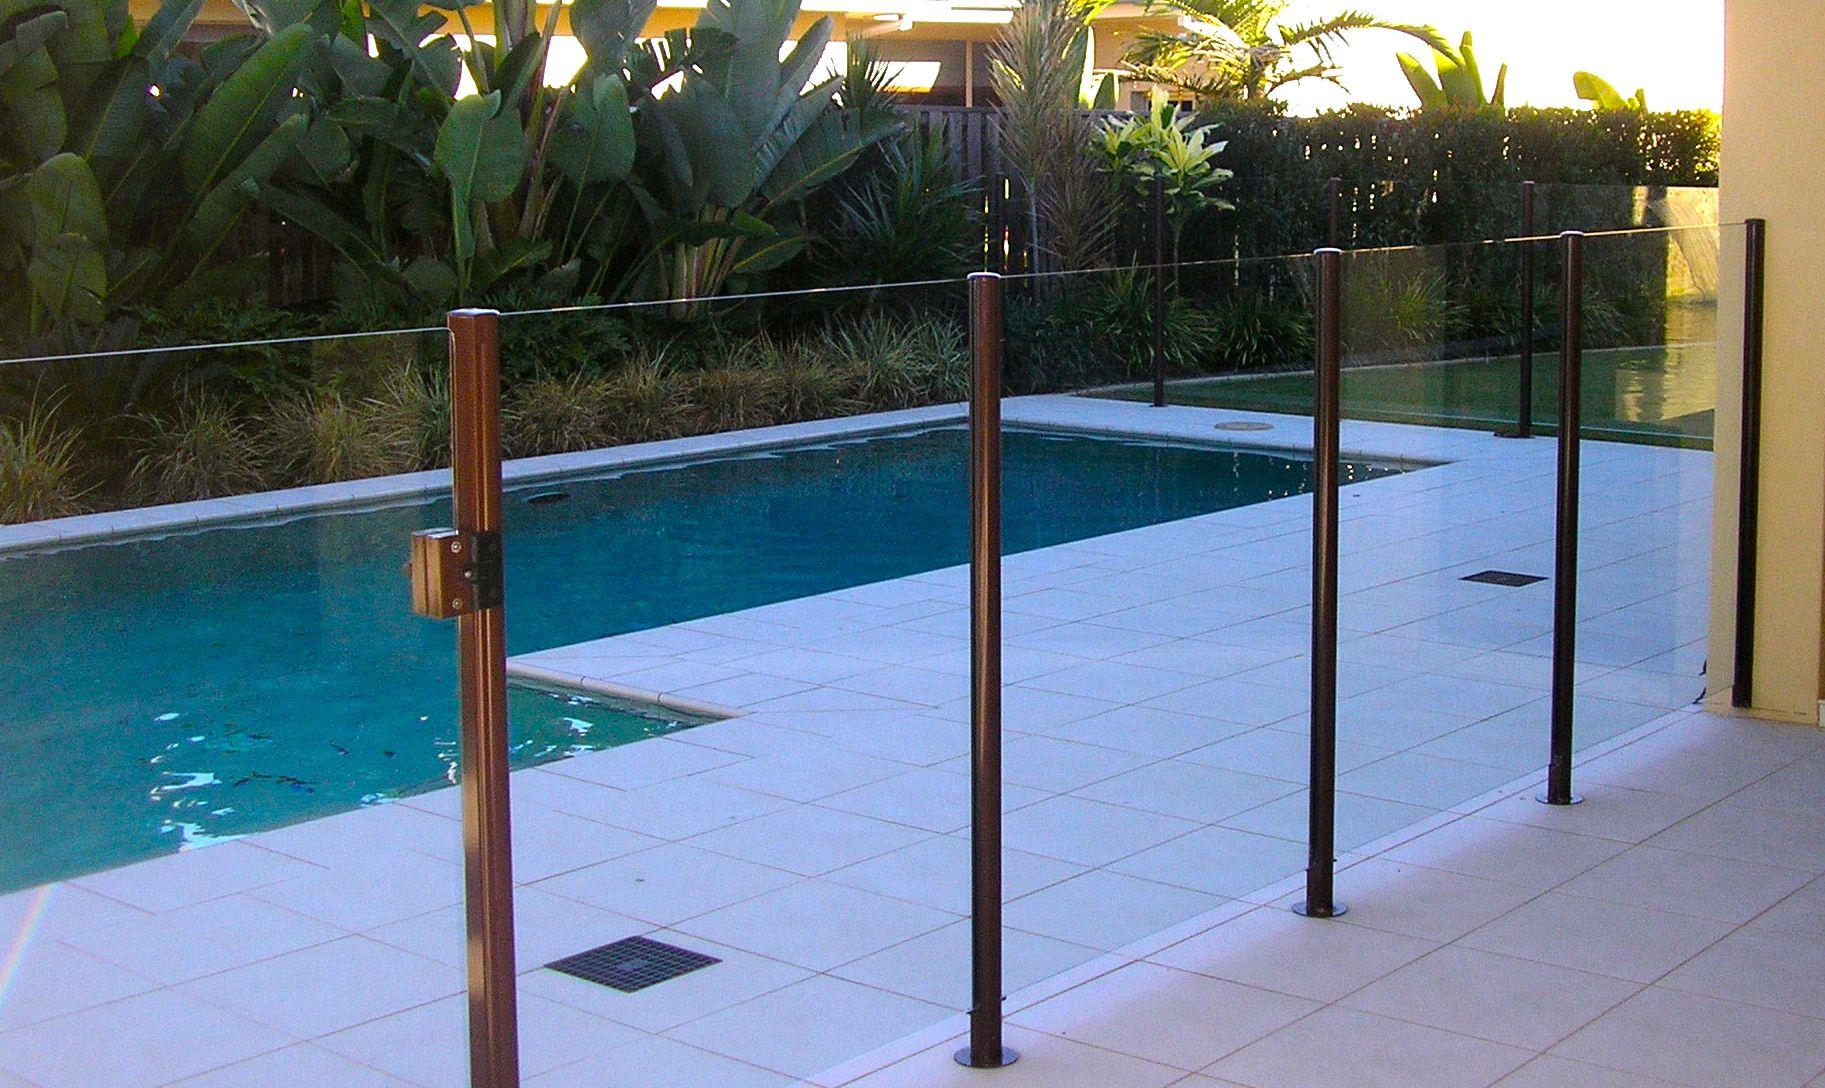 Semiframeless Glass Pool Fencing Stainless Steel Railing Glass Pool Fencing Pool Fence